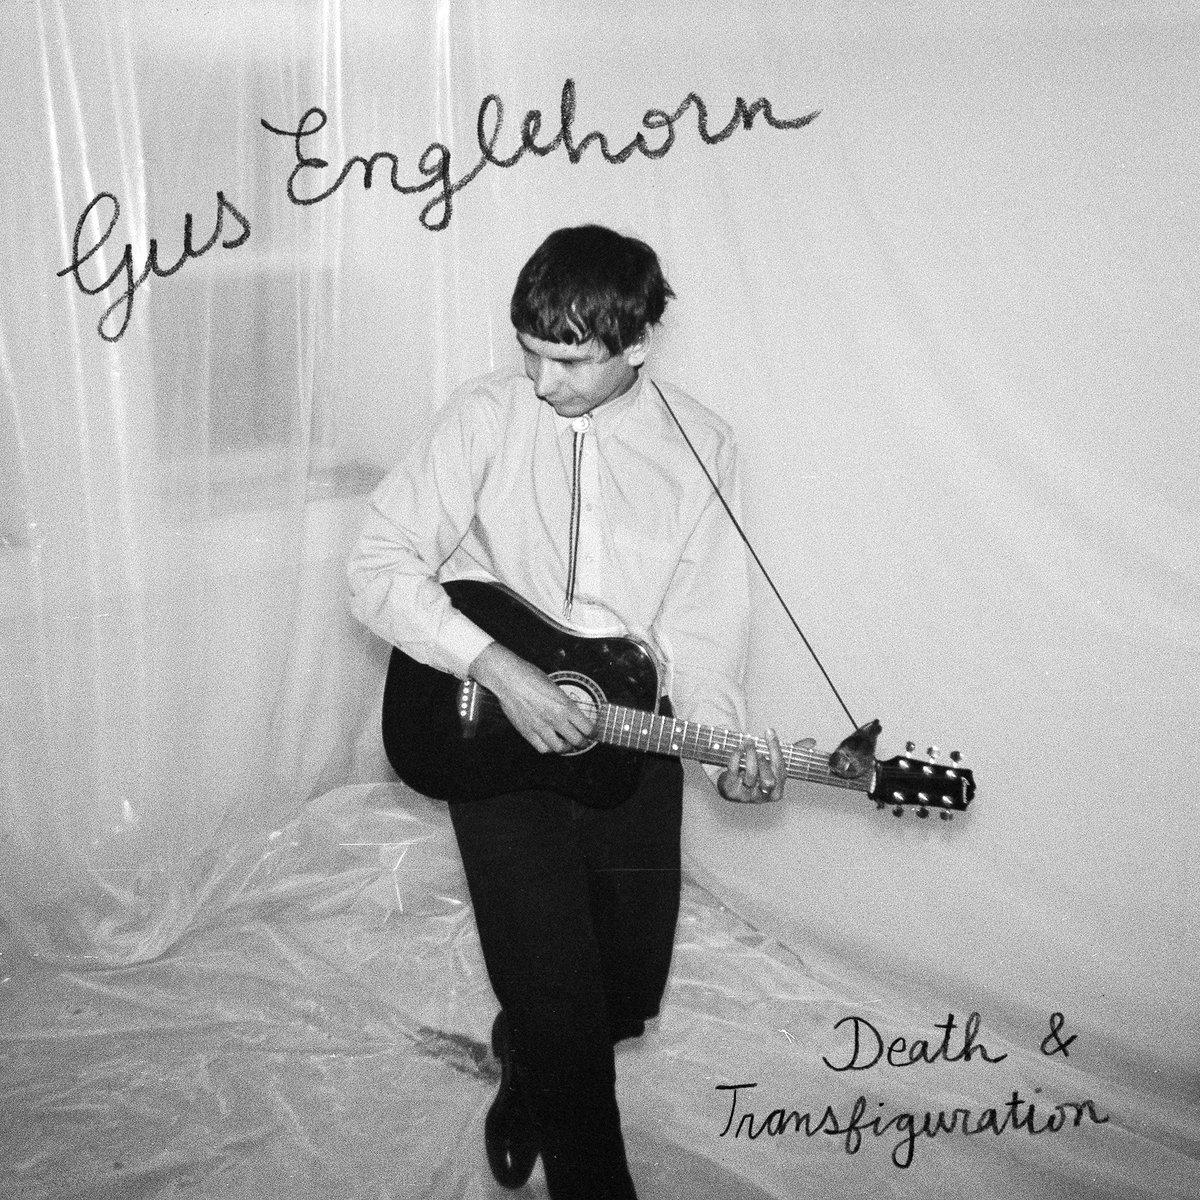 Death & Transfiguration | Gus Englehorn